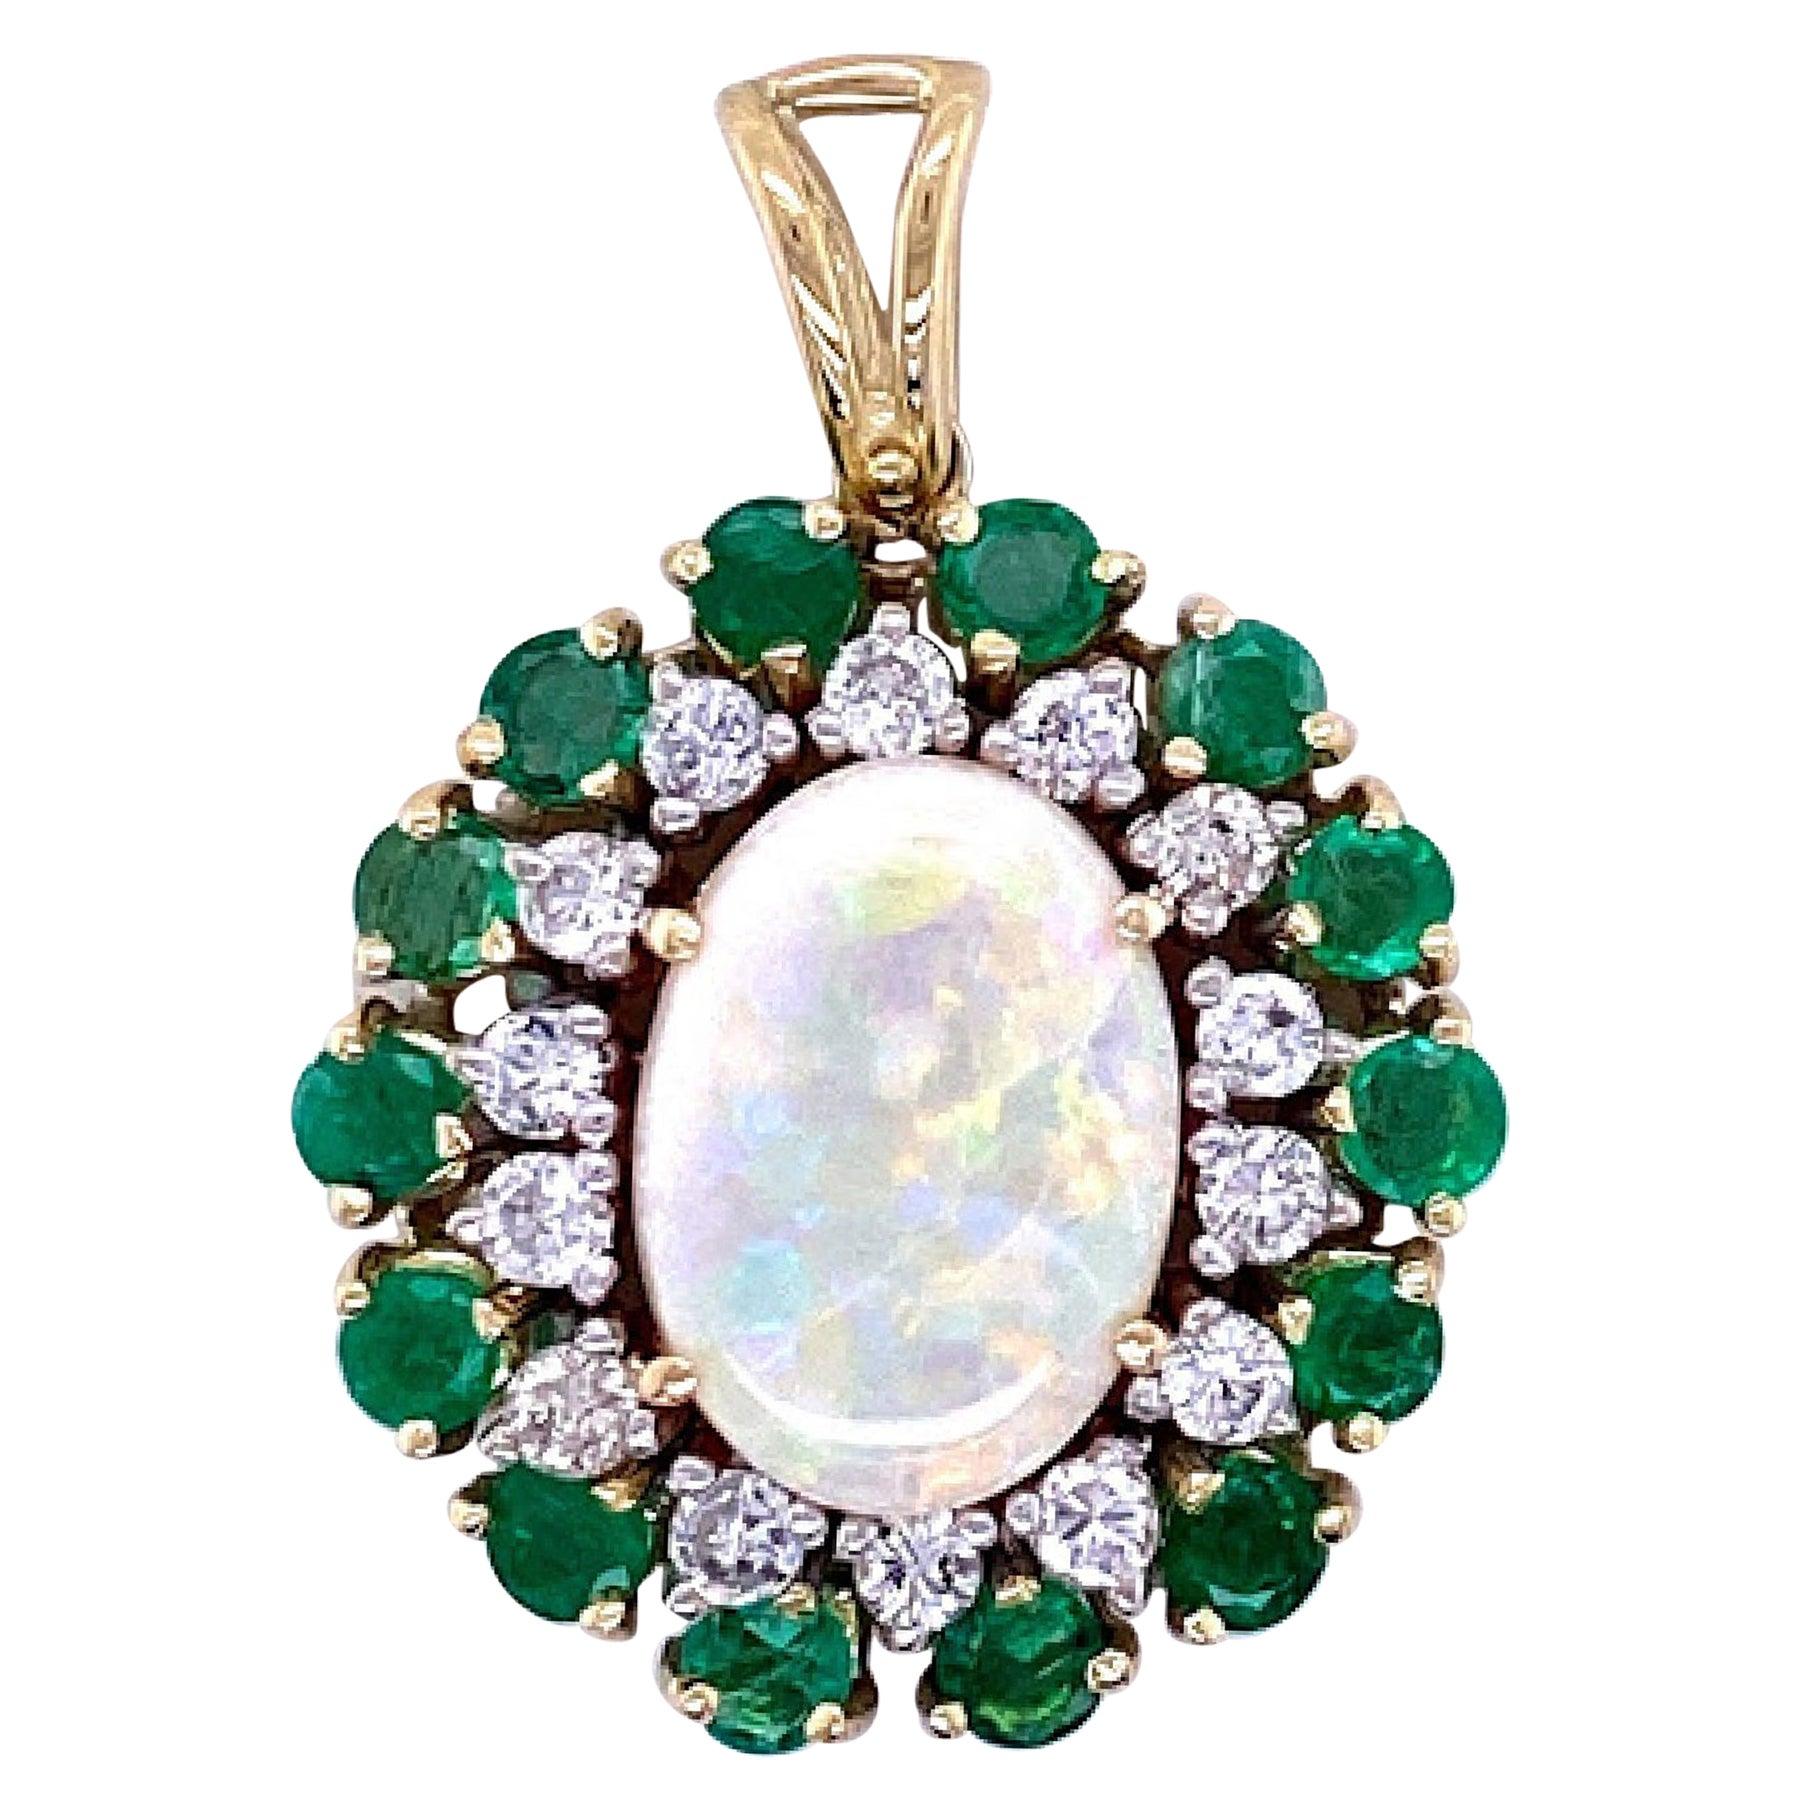 Opal, Emerald, and Diamond Pendant